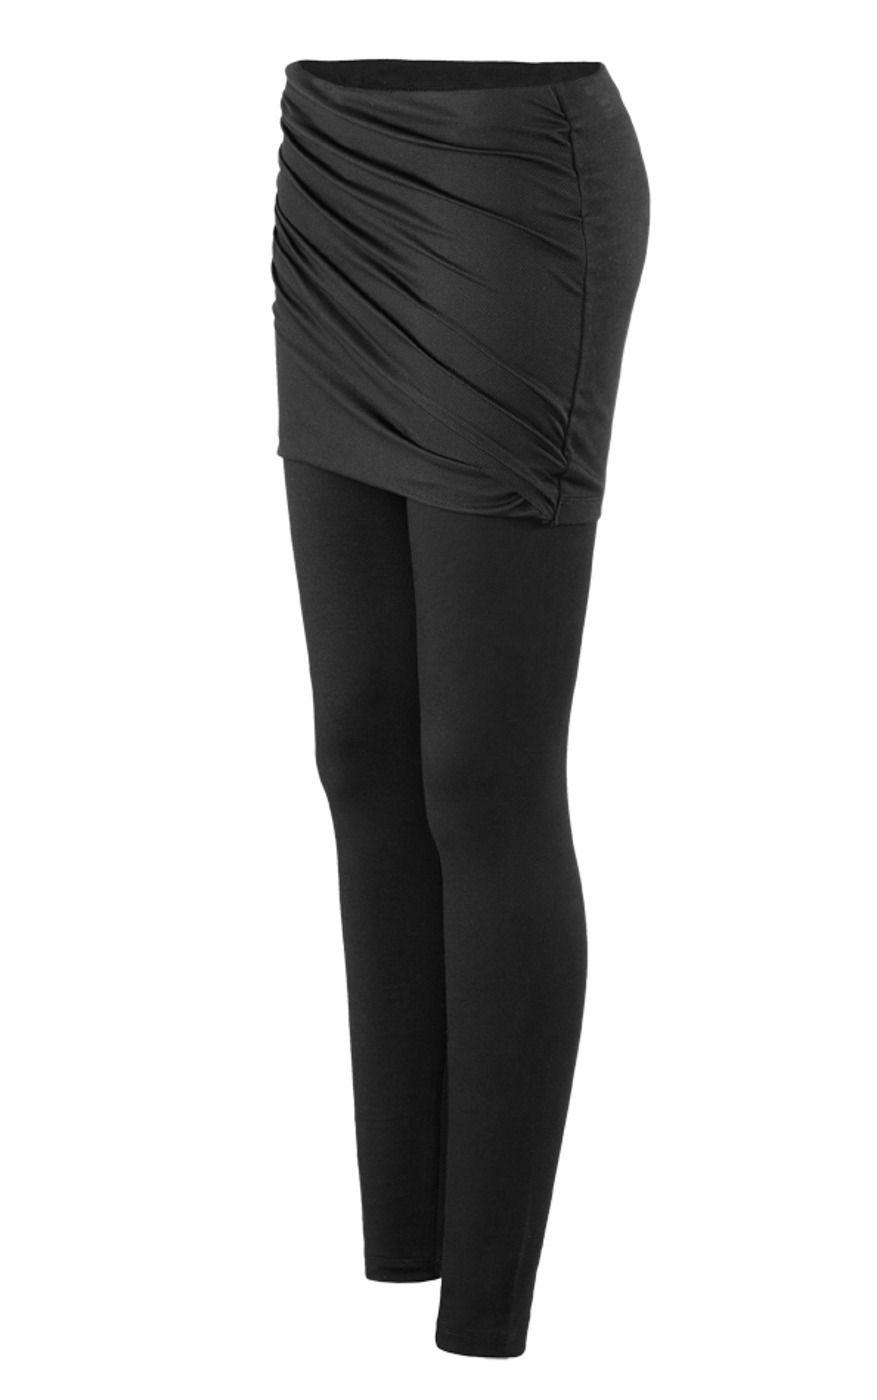 Mesh M' Leggings - cabi Spring 2016 Collection Cindyunger.cabionline.com